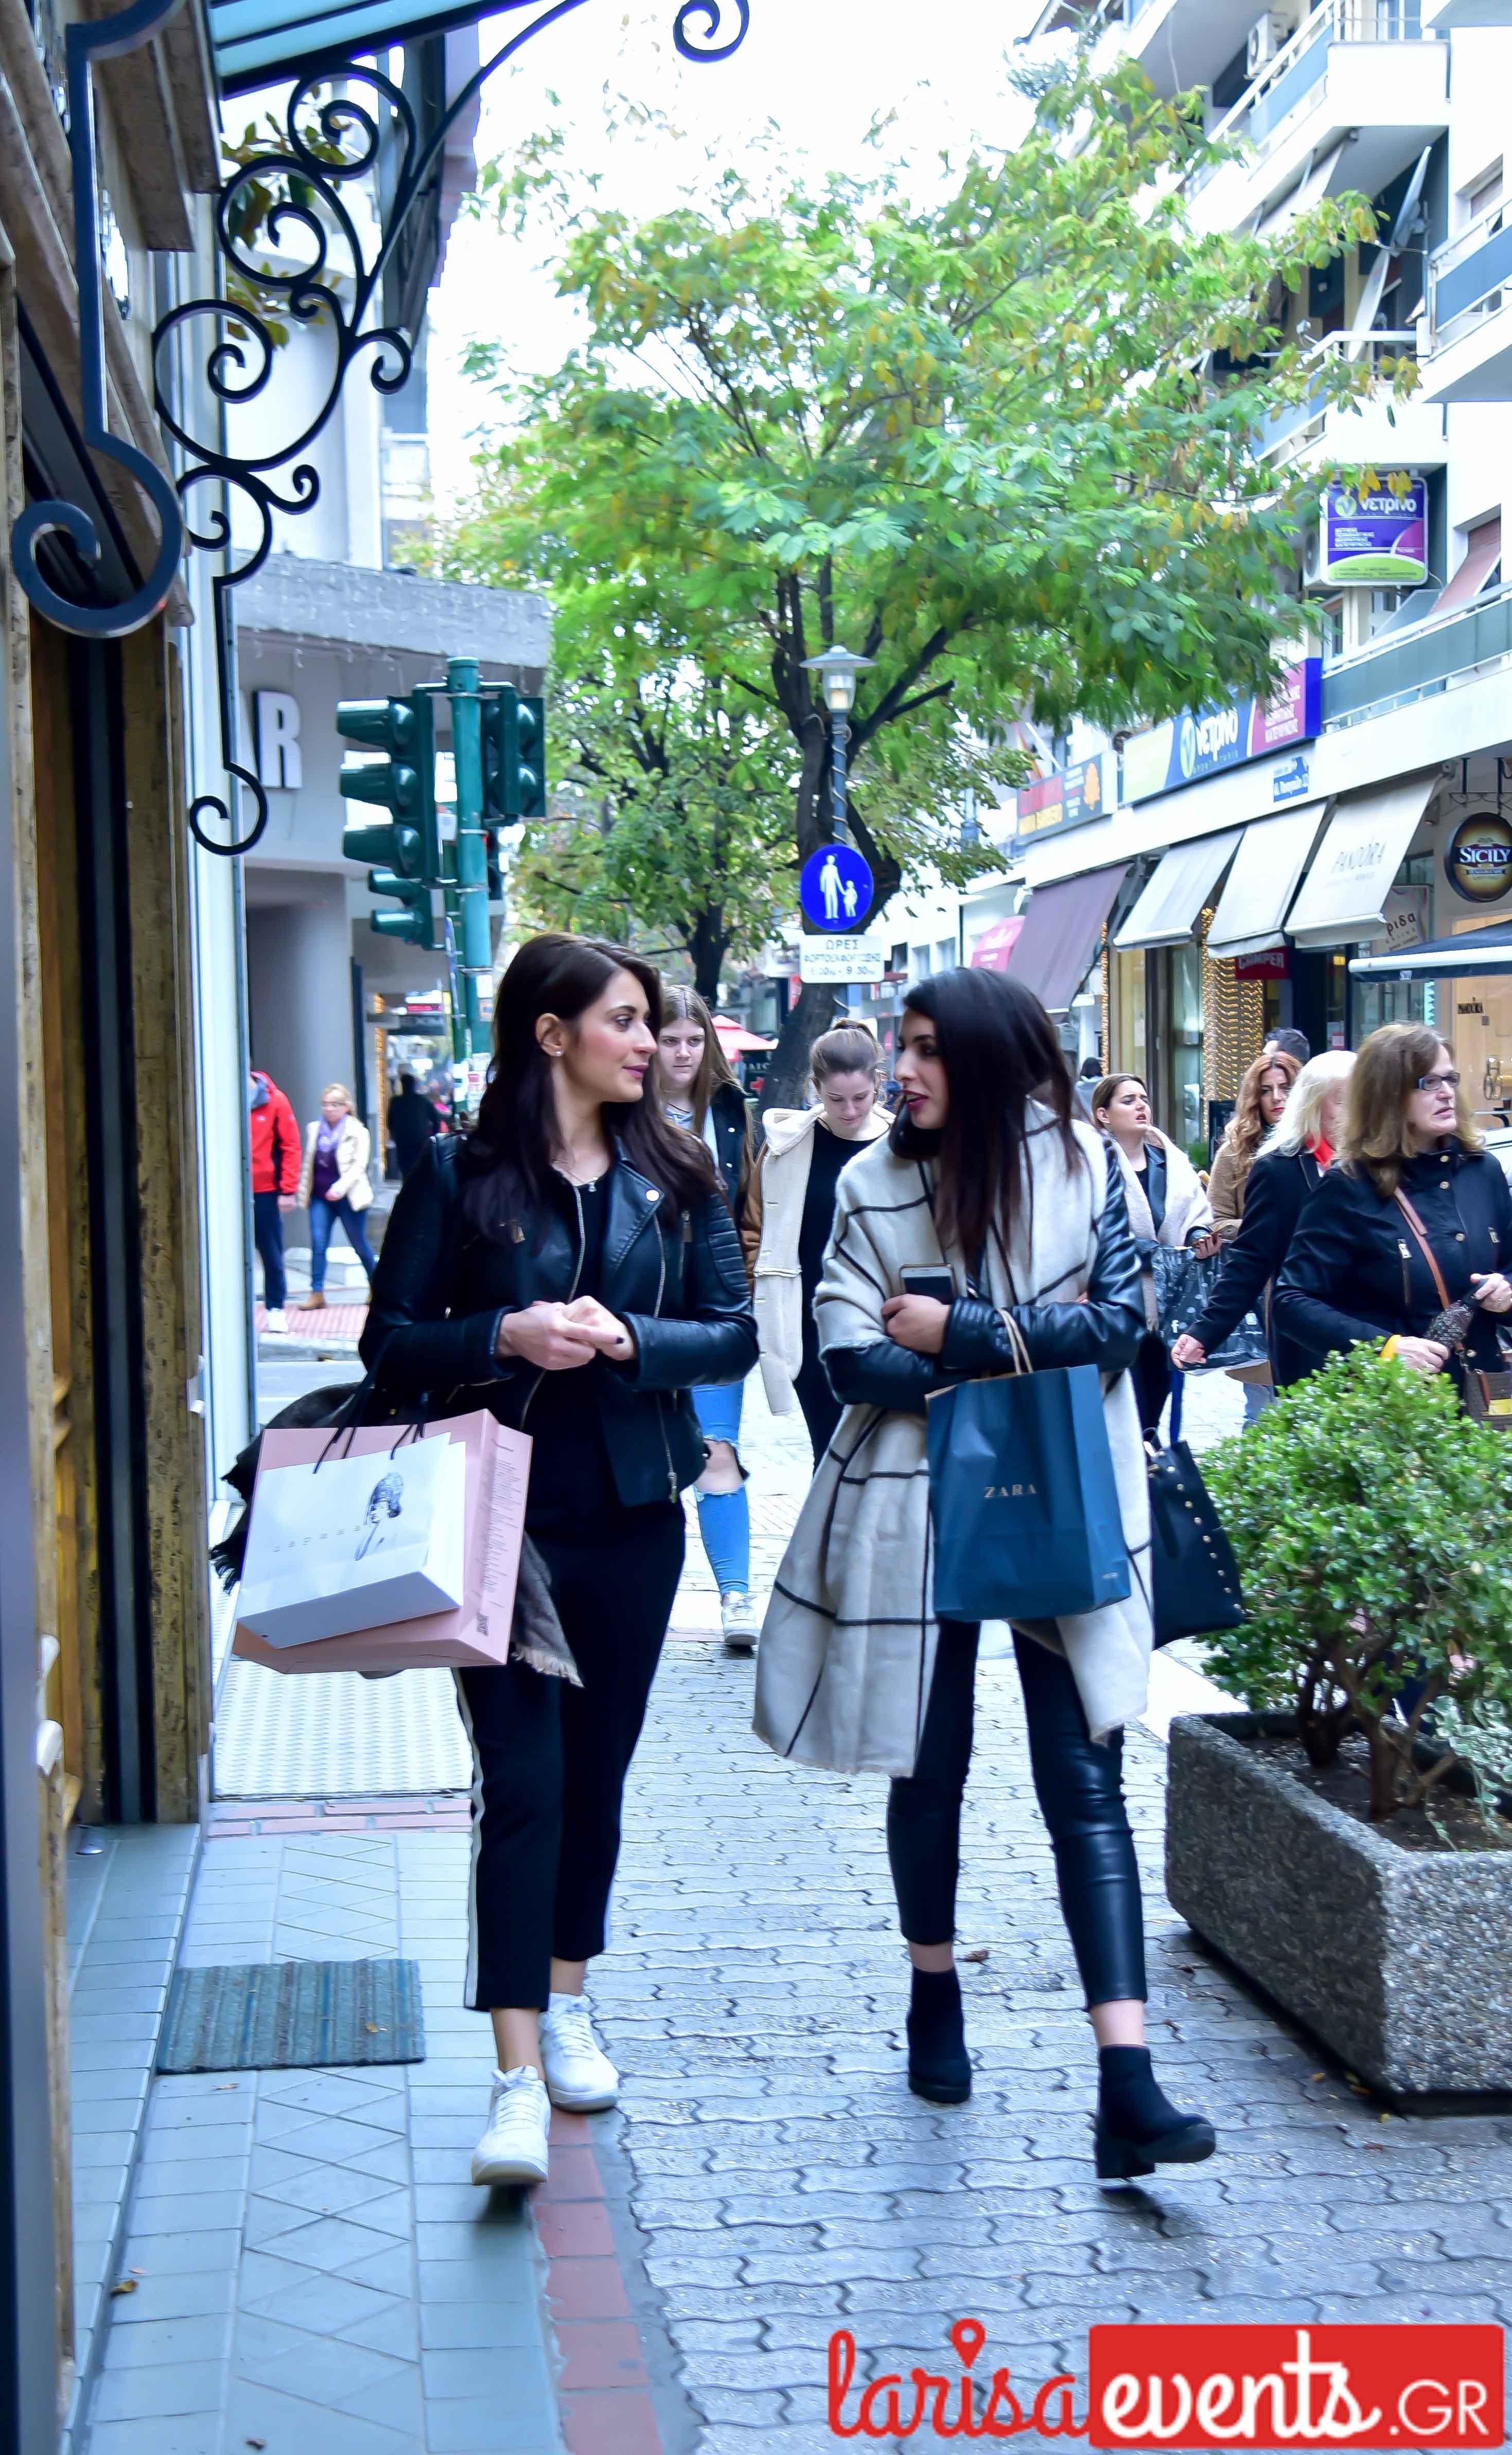 LAZ 6691 - Λάρισα's Street Style | Οι Λαρισαίοι σε street style clicks!